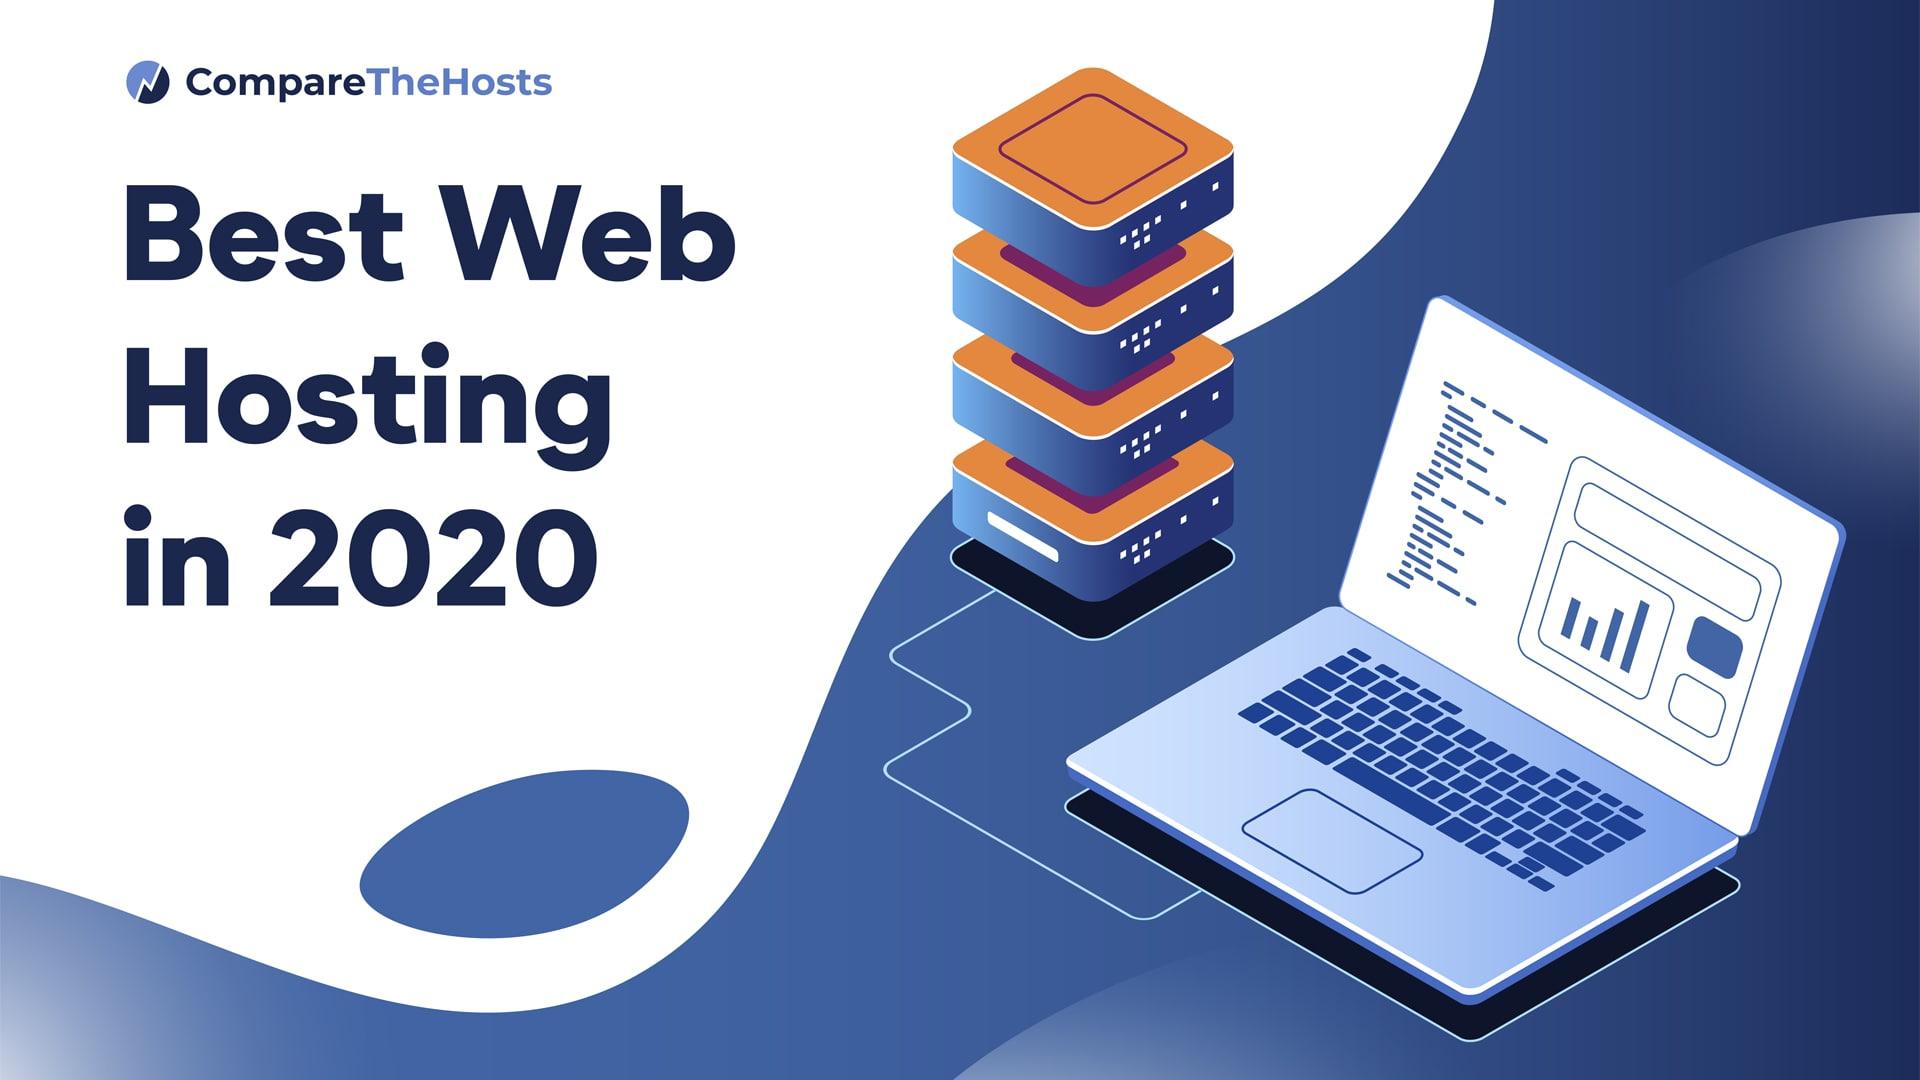 Top 15 Best Web Hosting Comparison Guide Reviews Of 2020